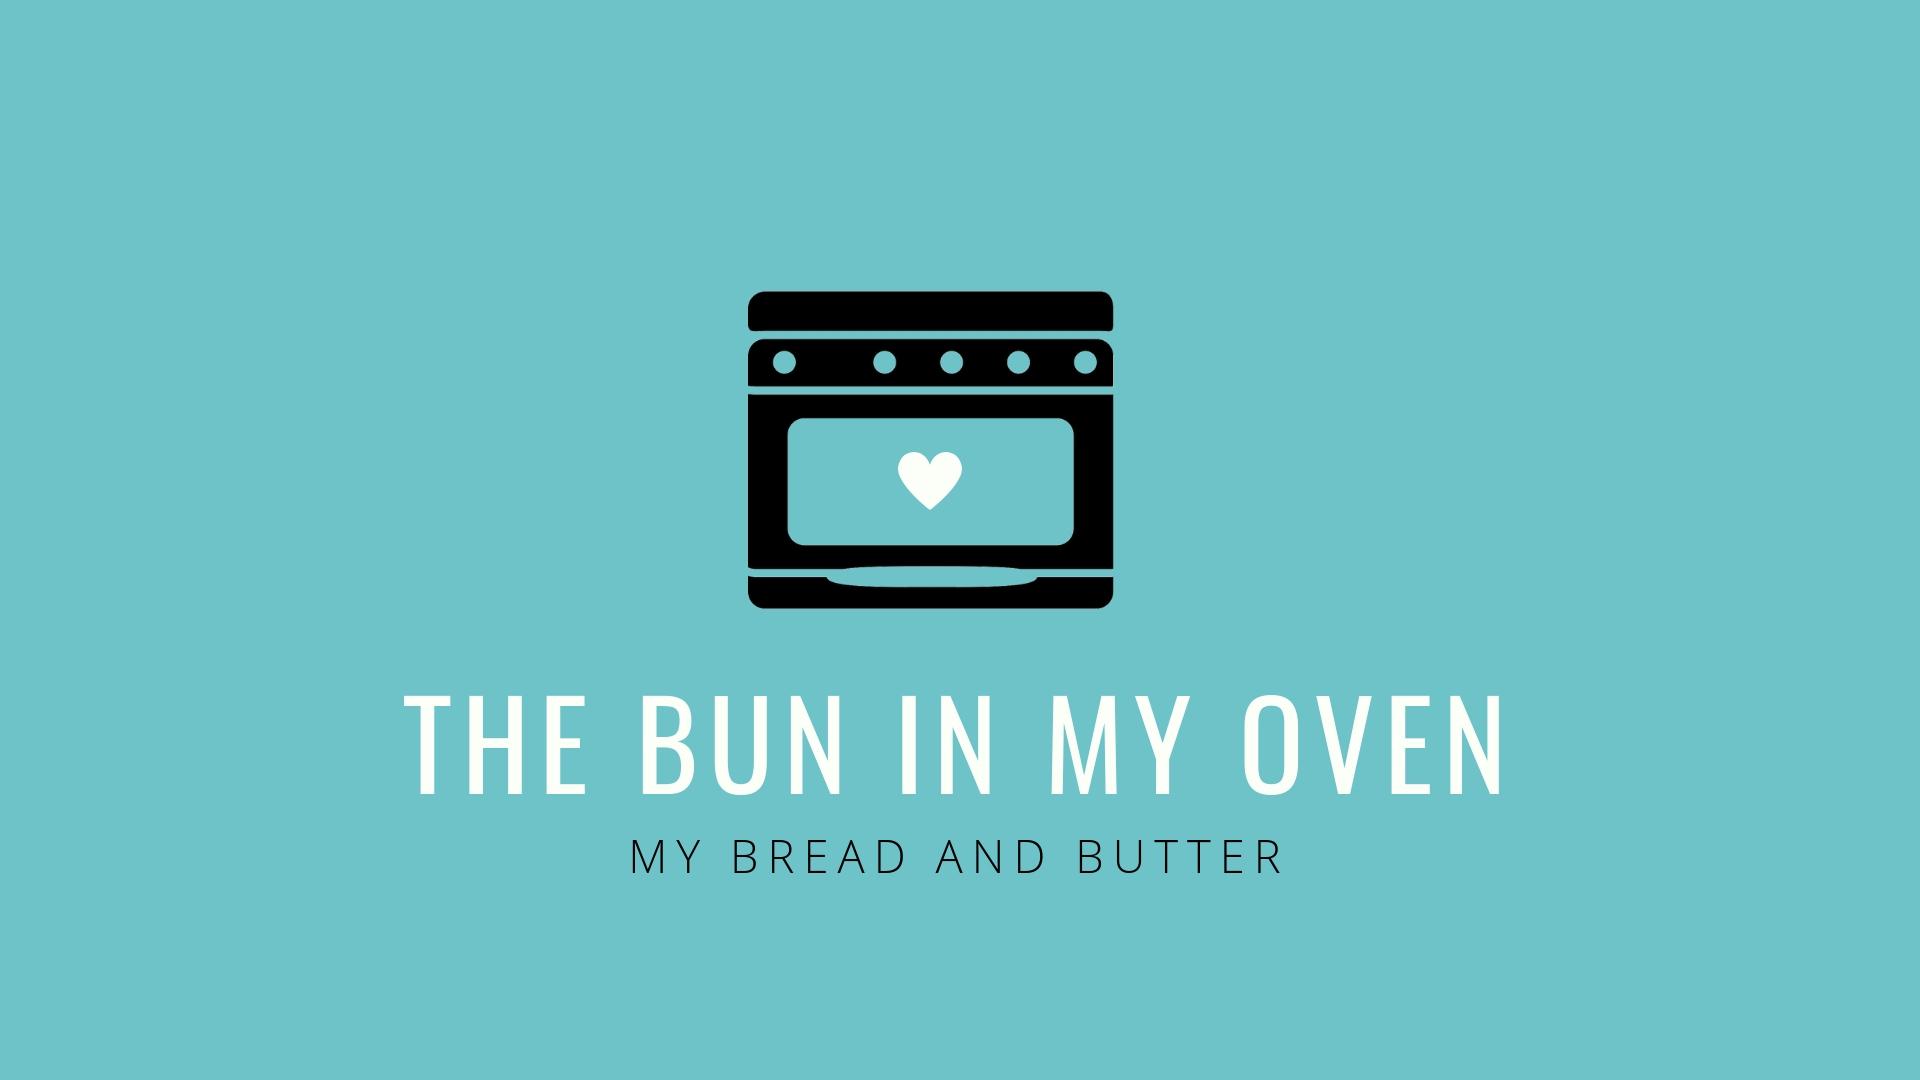 jennifer hulley food photographer food stylist food writer blogger hamilton toronto ontario